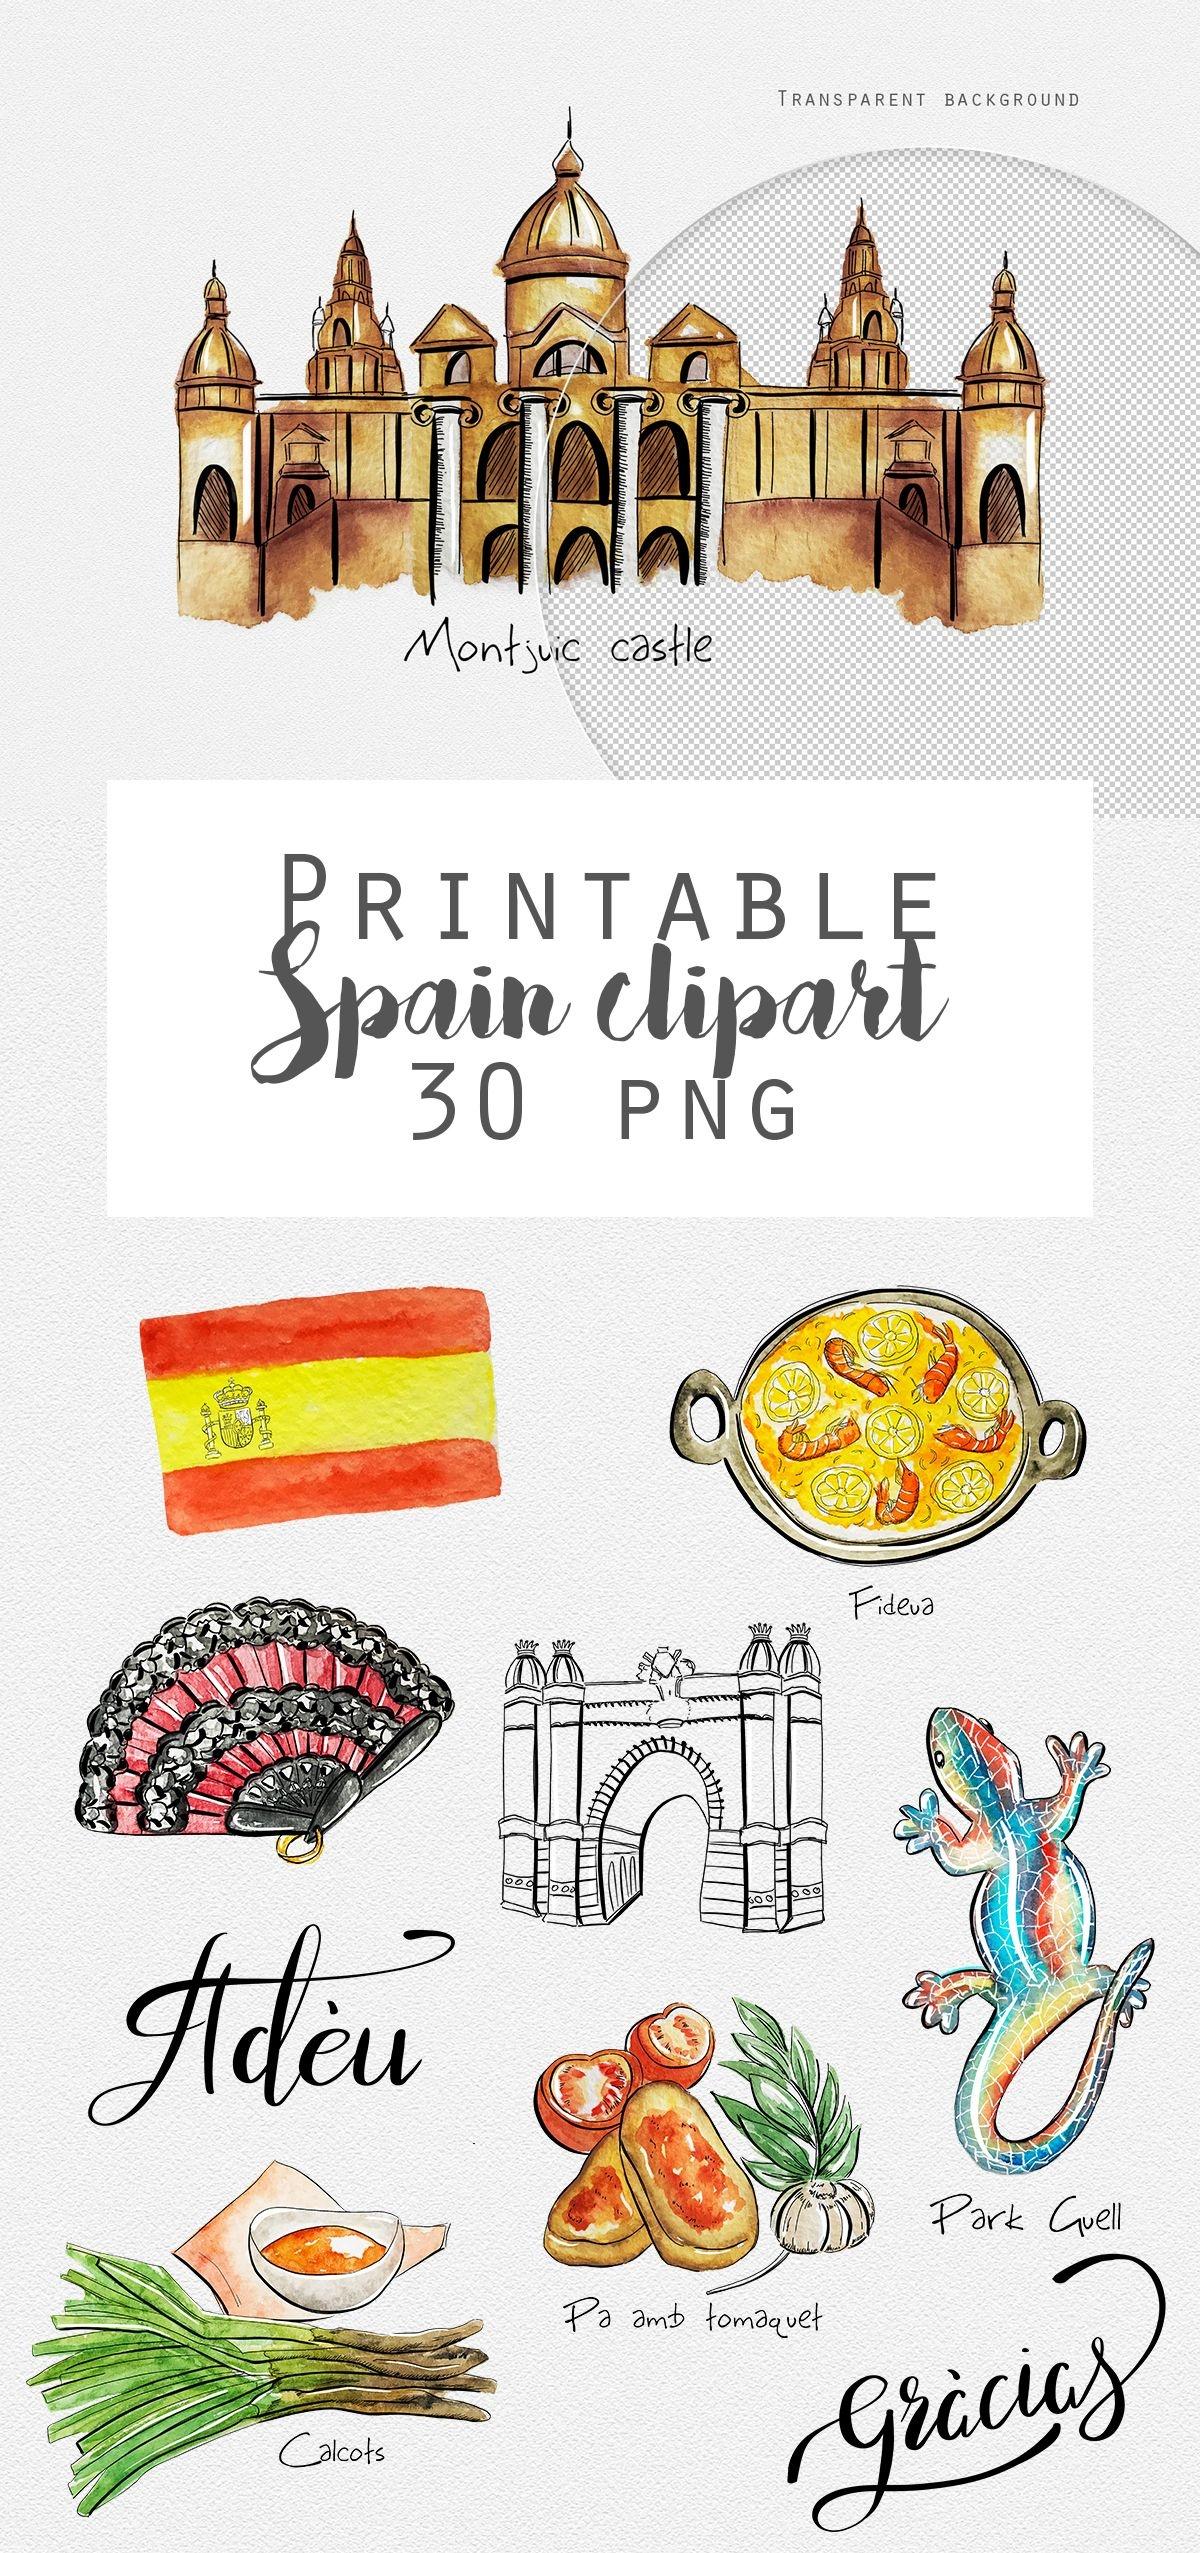 Spain Travel Stickers Printable Barcelona Madrid Digital Stickers - Free Printable Travel Stickers